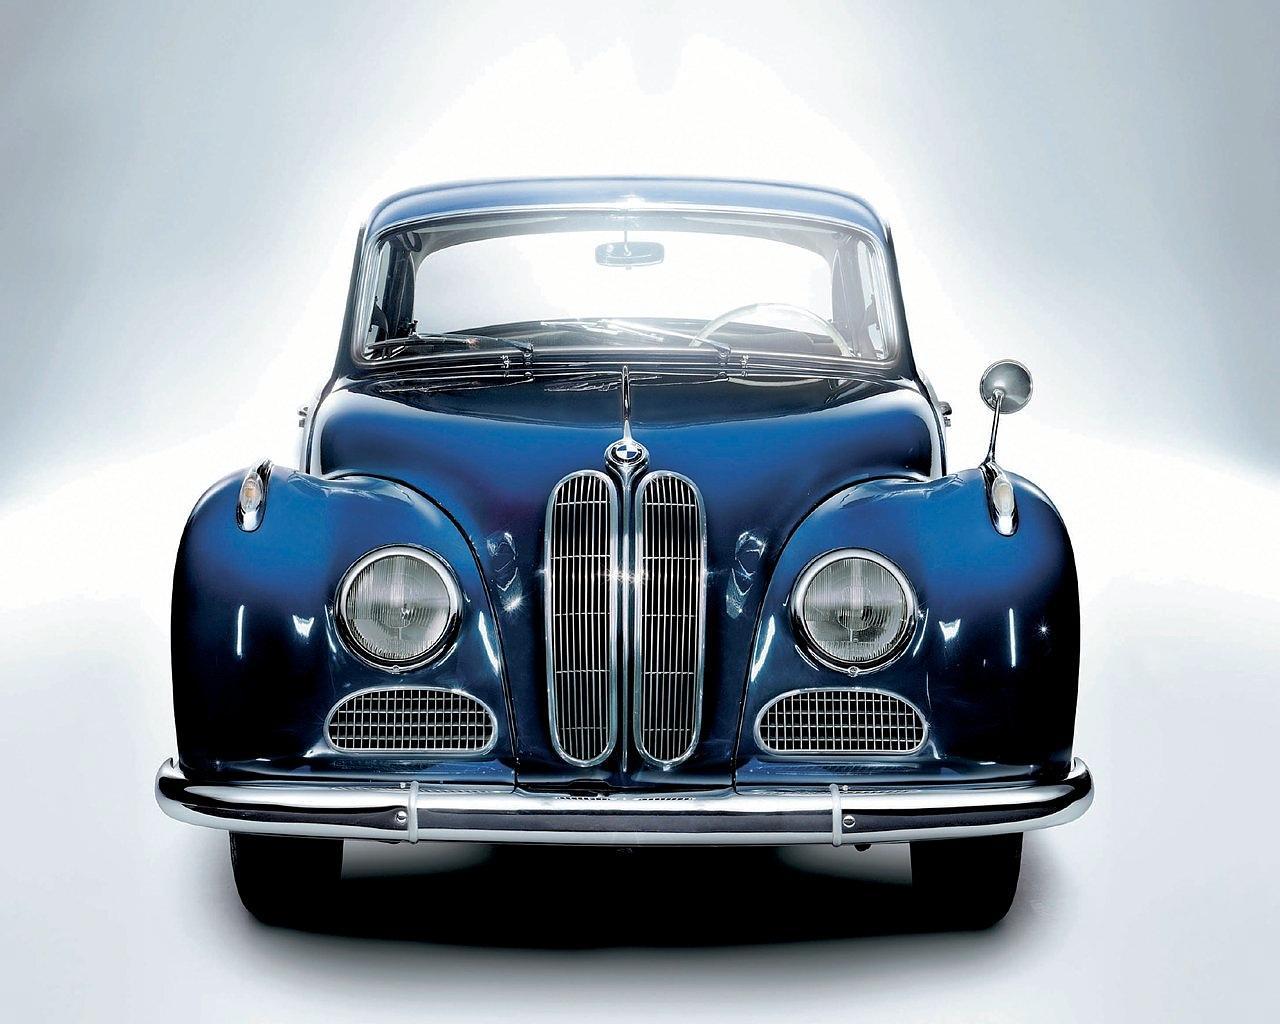 Green Auto Sales >> BMW 501/502 - 1952, 1953, 1954, 1955, 1956, 1957, 1958, 1959, 1960, 1961, 1962, 1963, 1964 ...